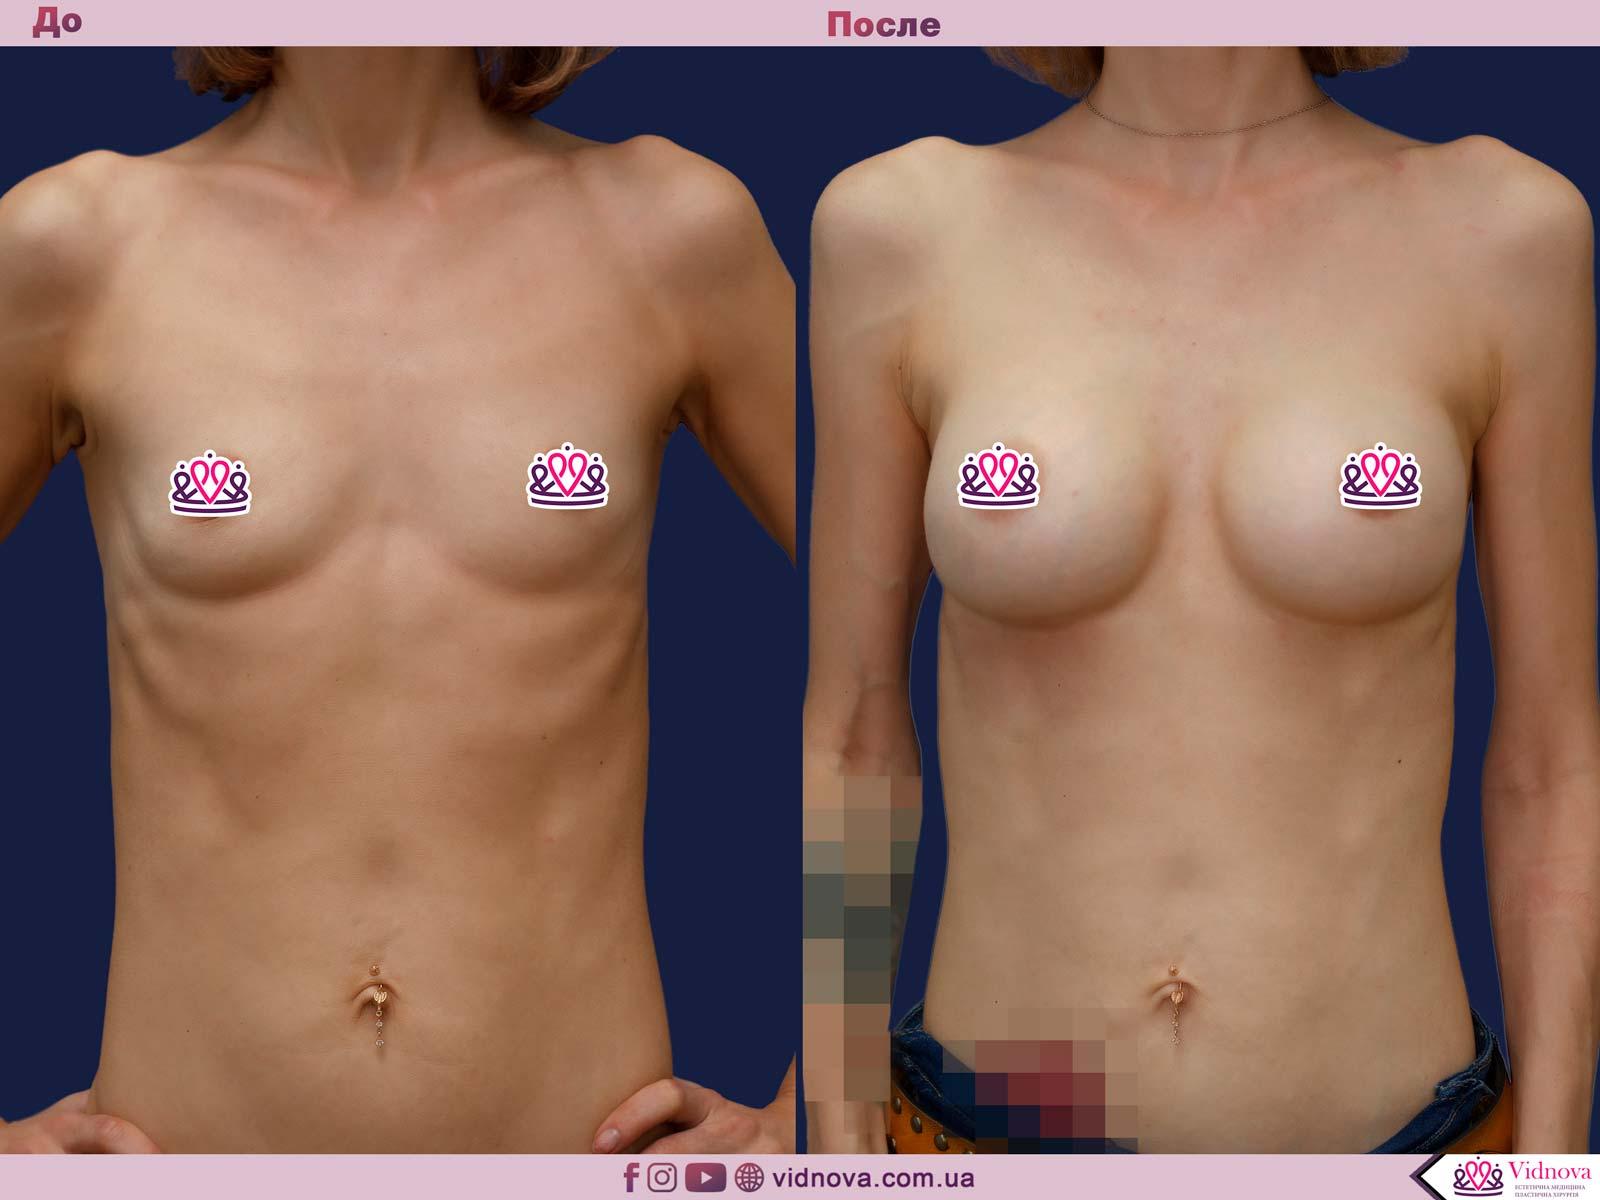 Увеличение груди: Фото ДО и ПОСЛЕ - Пример №65-1 - Клиника Vidnova